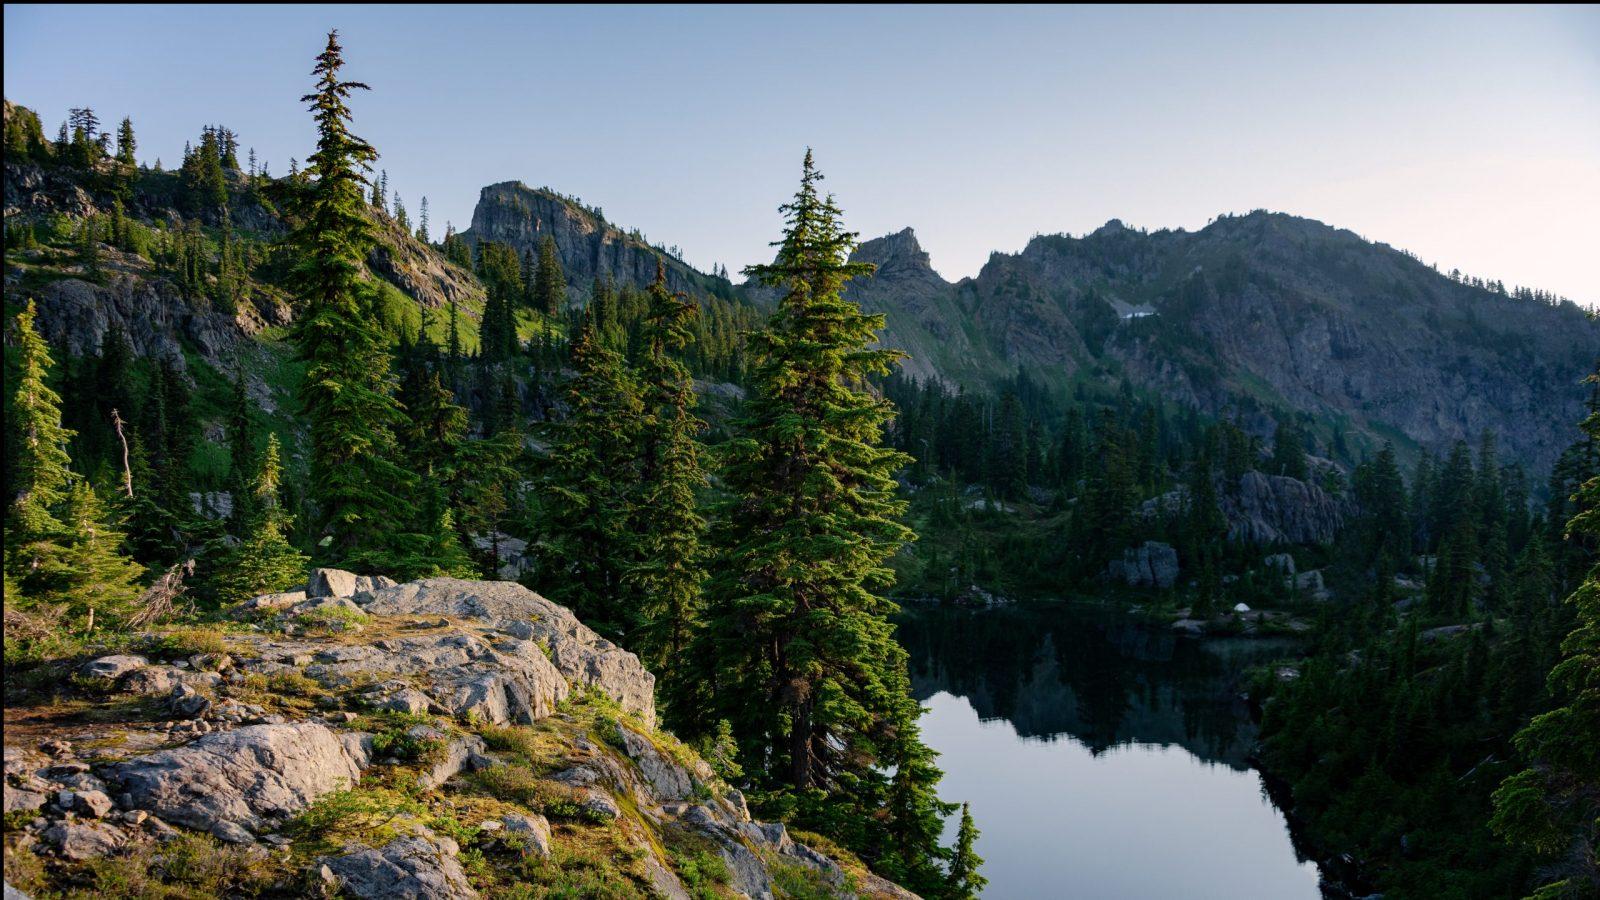 Sunrise at Lila Lake in the Alpine Lake Wilderness. Central Cascade mountain range, Washington State, July 2019.